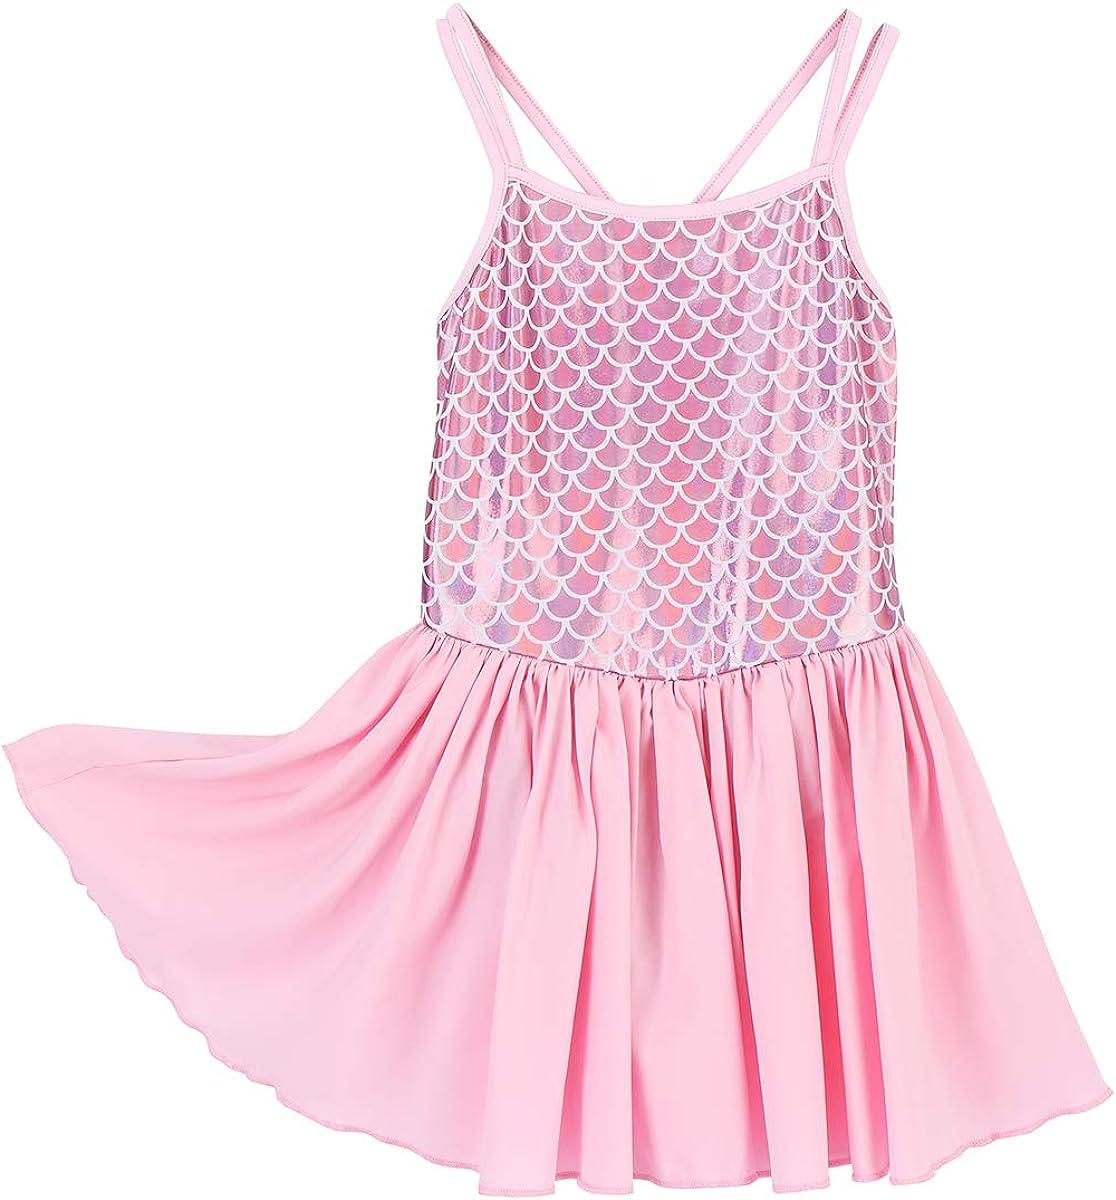 Girls Ballet Gymnastics Dance Leotard Tutu Dress Mermaid Scales Dancing Costume